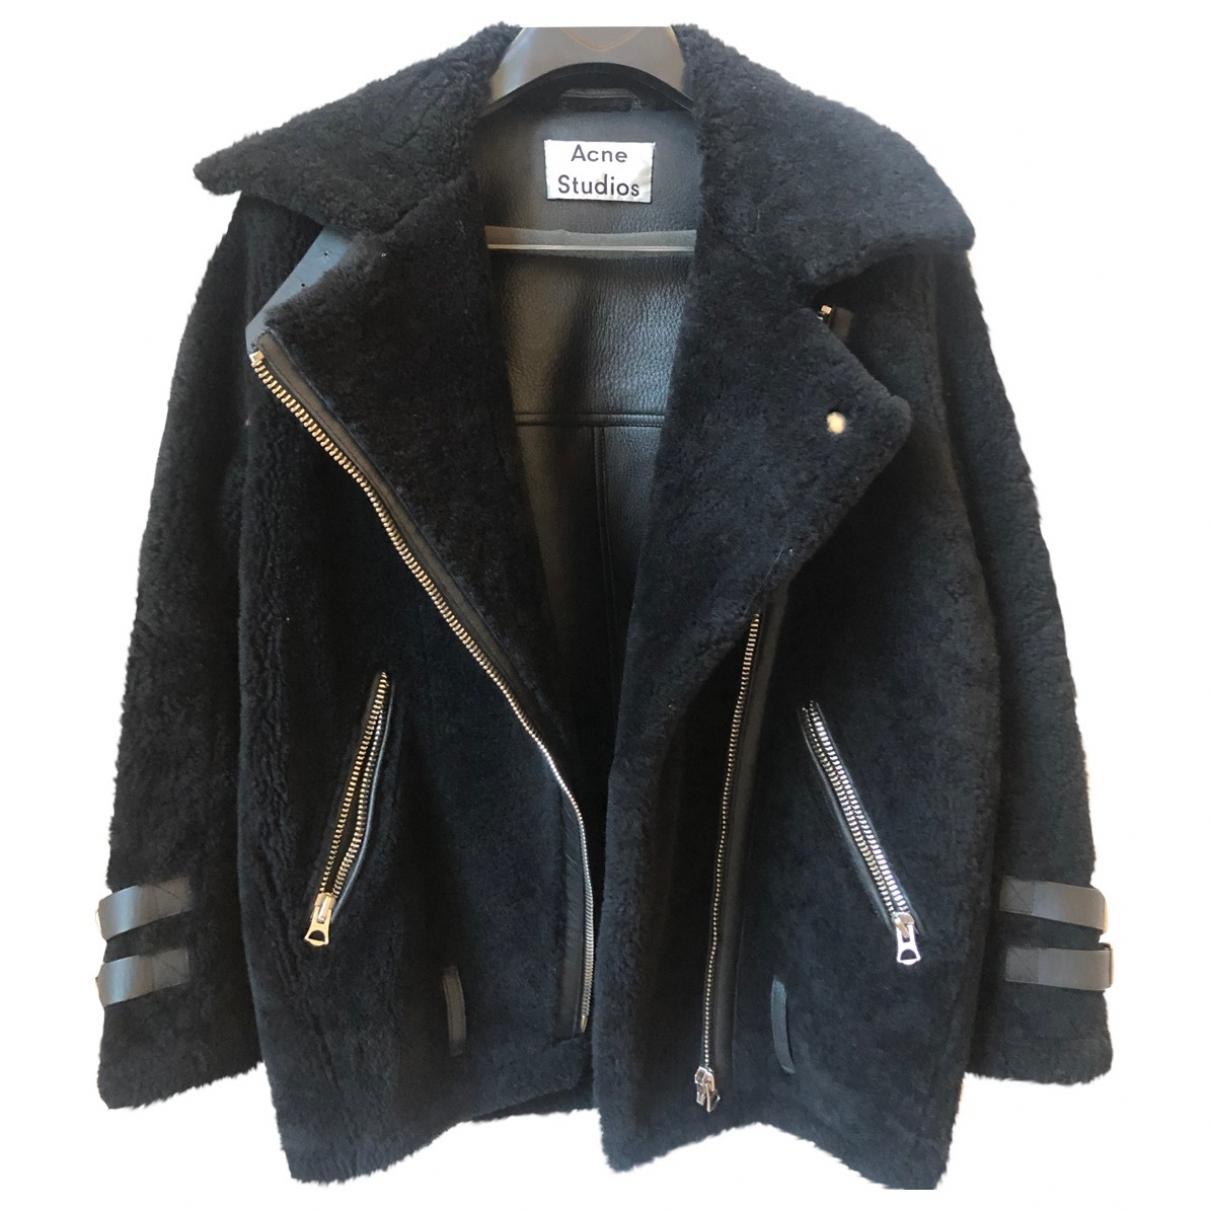 Acne Studios Velocite Black Shearling Leather jacket for Women XXS International